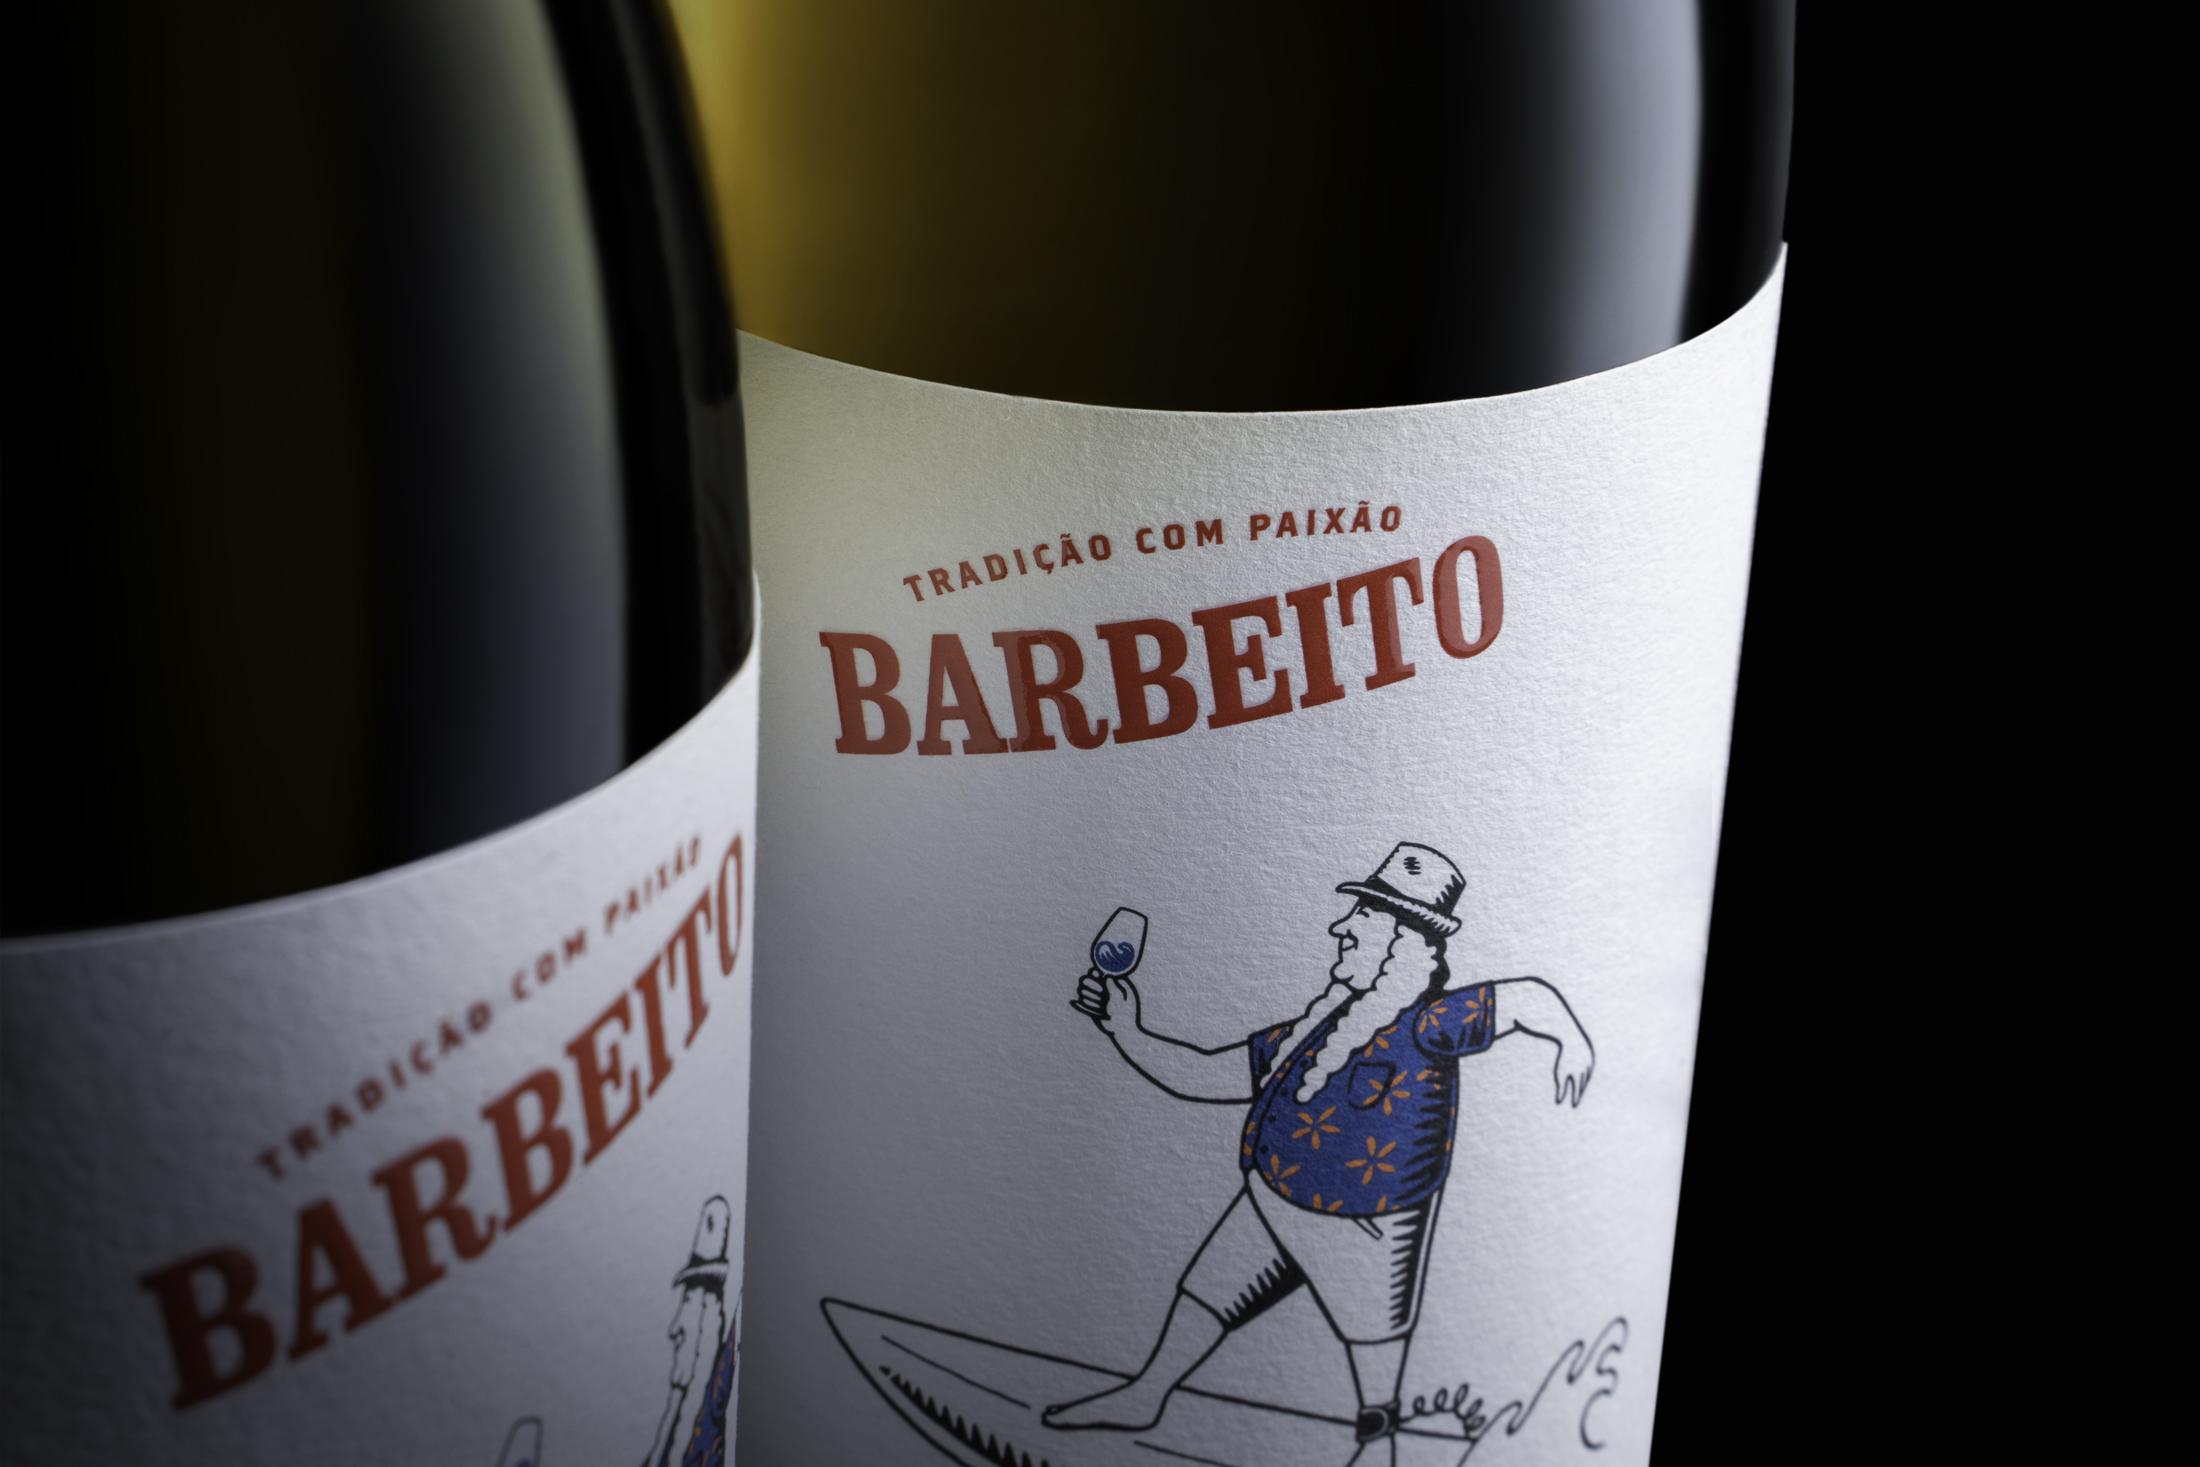 Barbeito Wine Label Design by Nauvegar